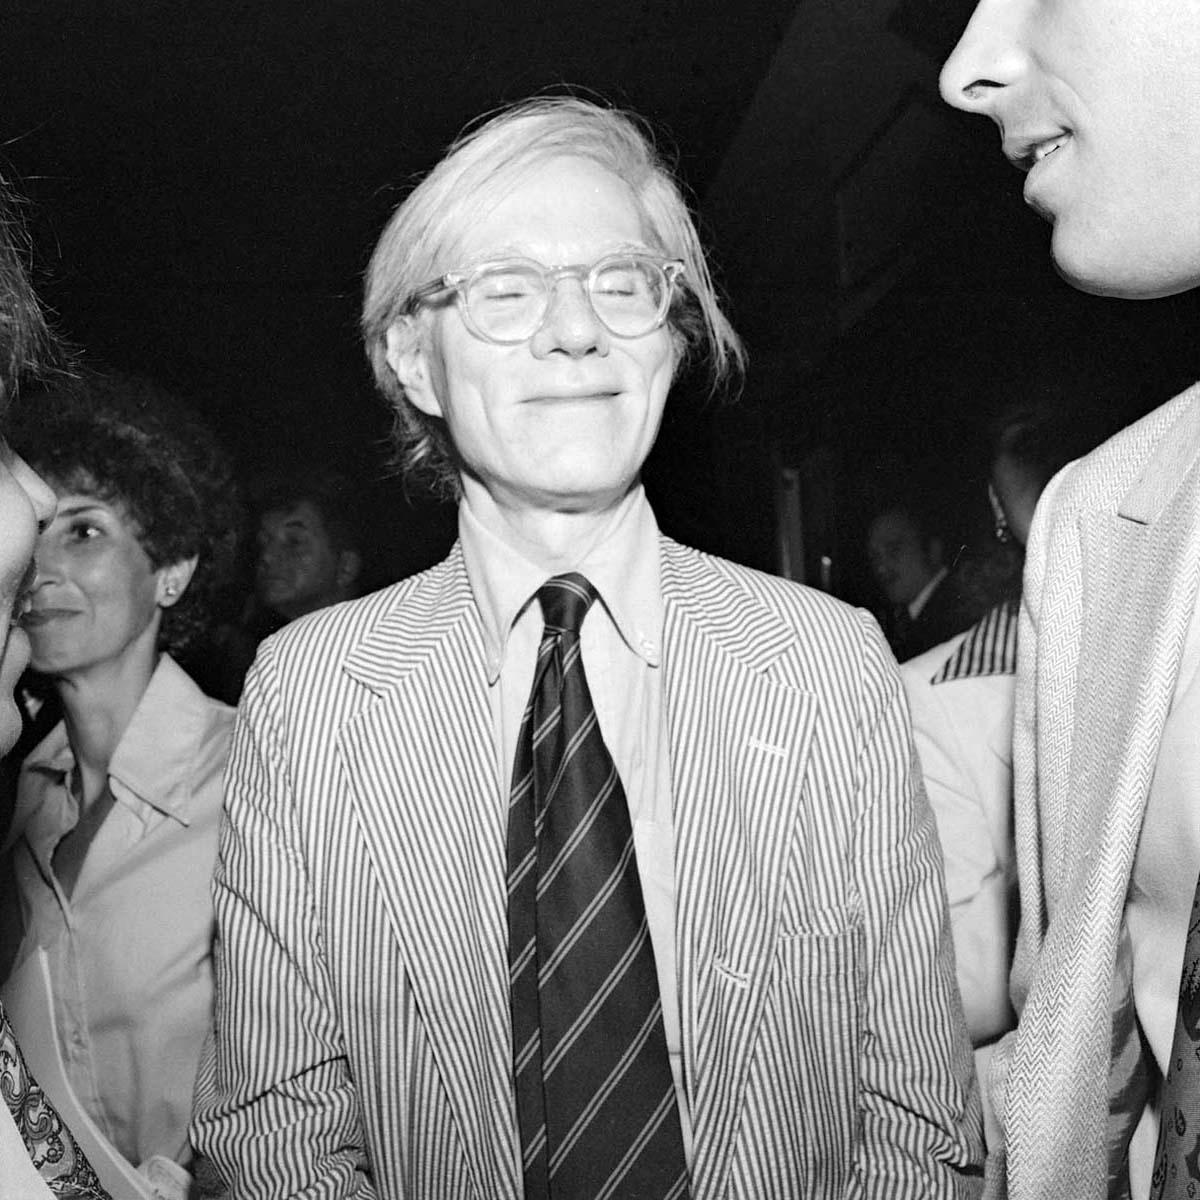 Warhol Eyes Closed (between his friend and Judi Jupiter), Studio 54, July 1977